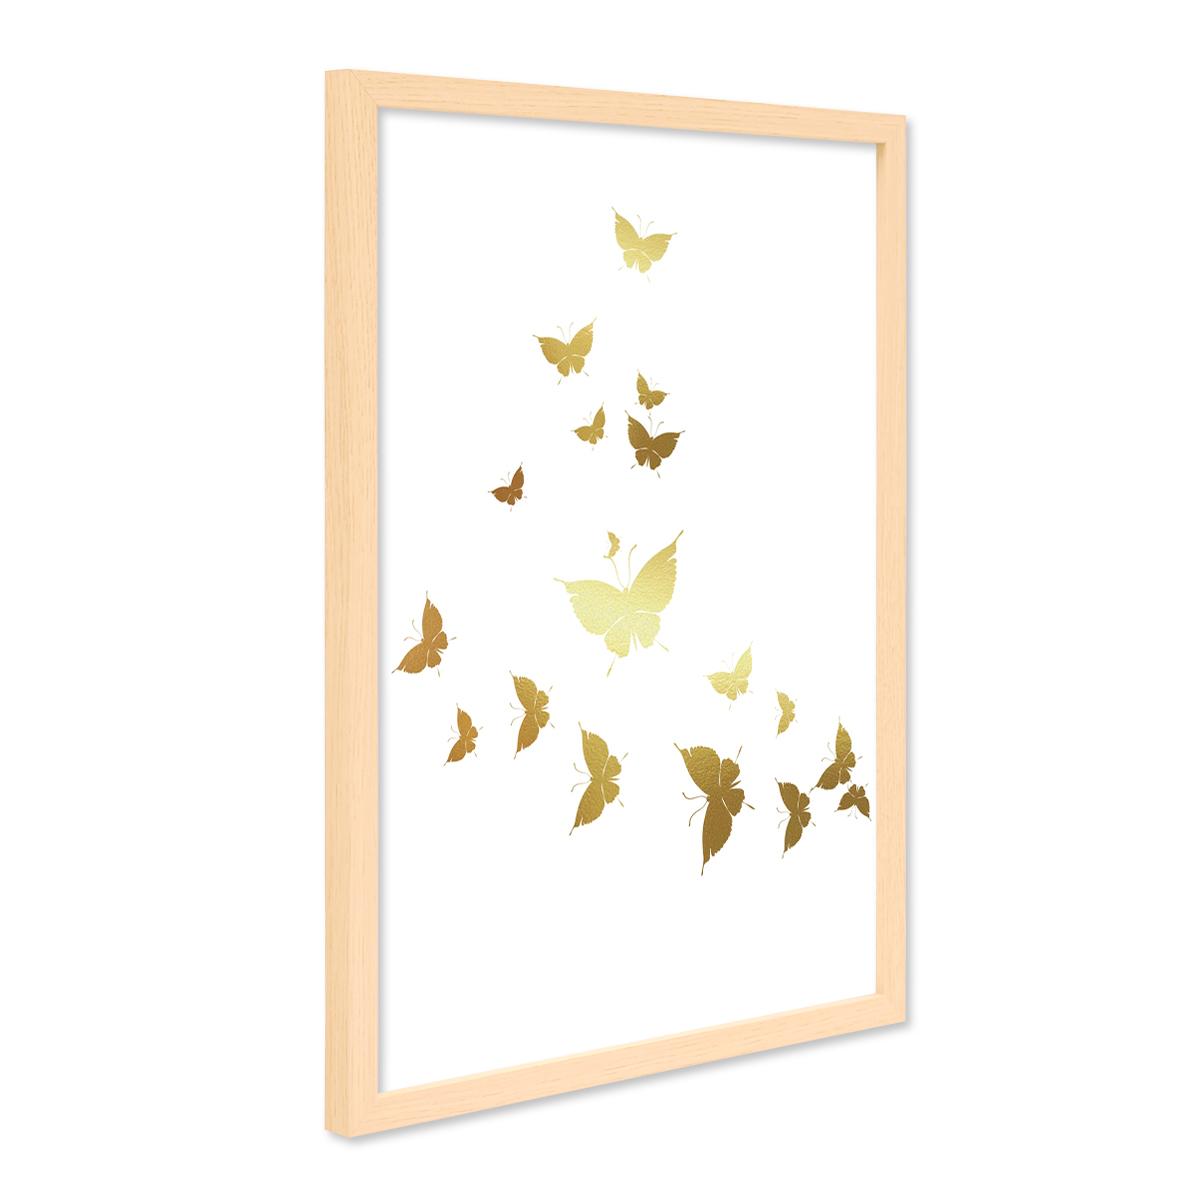 Design-Poster mit Bilderrahmen Natur \'Butterflies Gold\' 30x40 cm ...